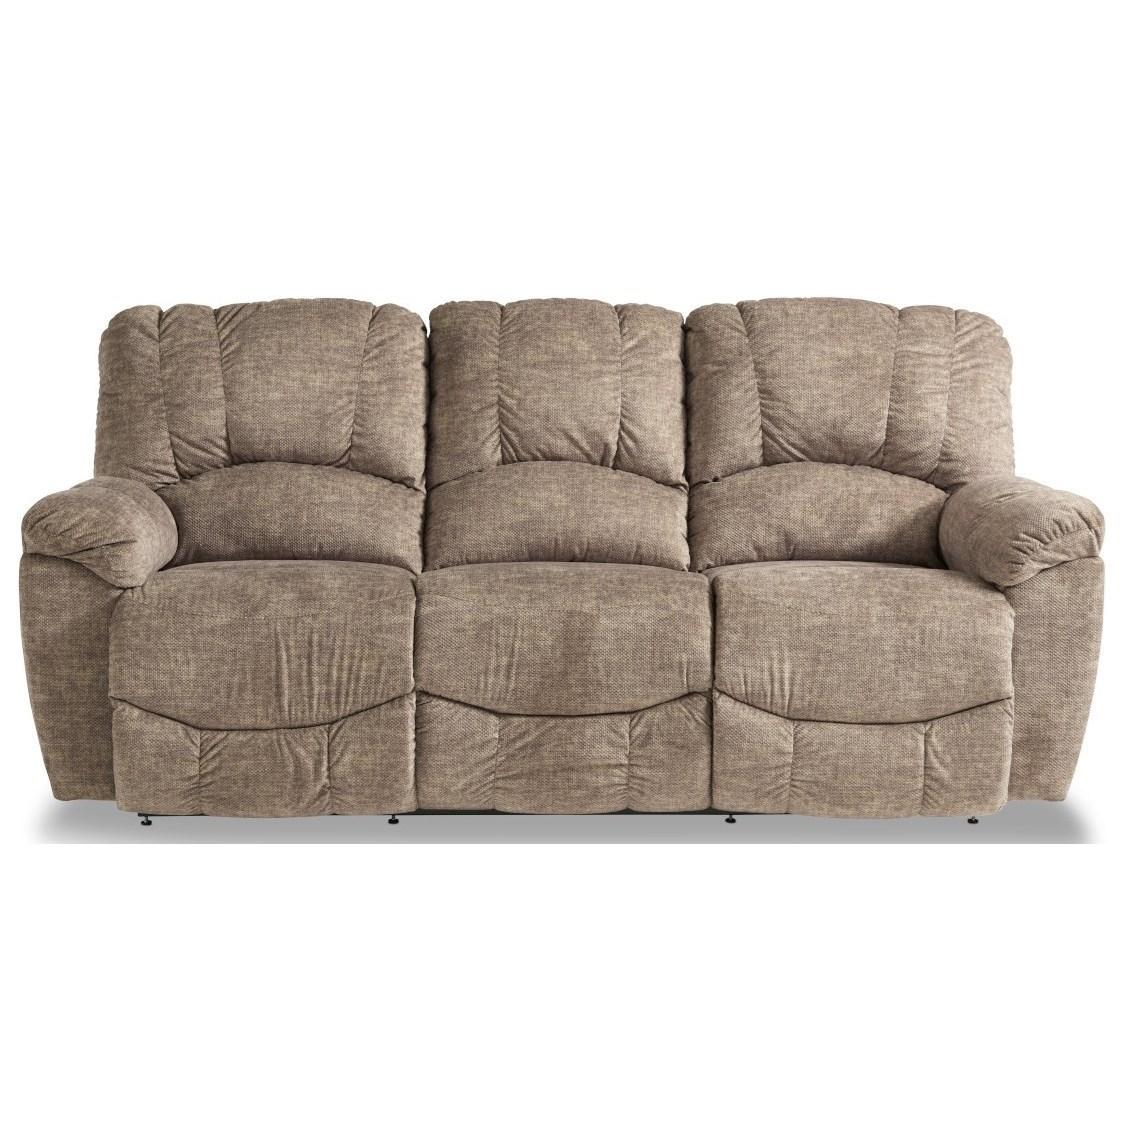 Hayes La-Z-Time®Full Reclining Sofa by La-Z-Boy at Johnny Janosik